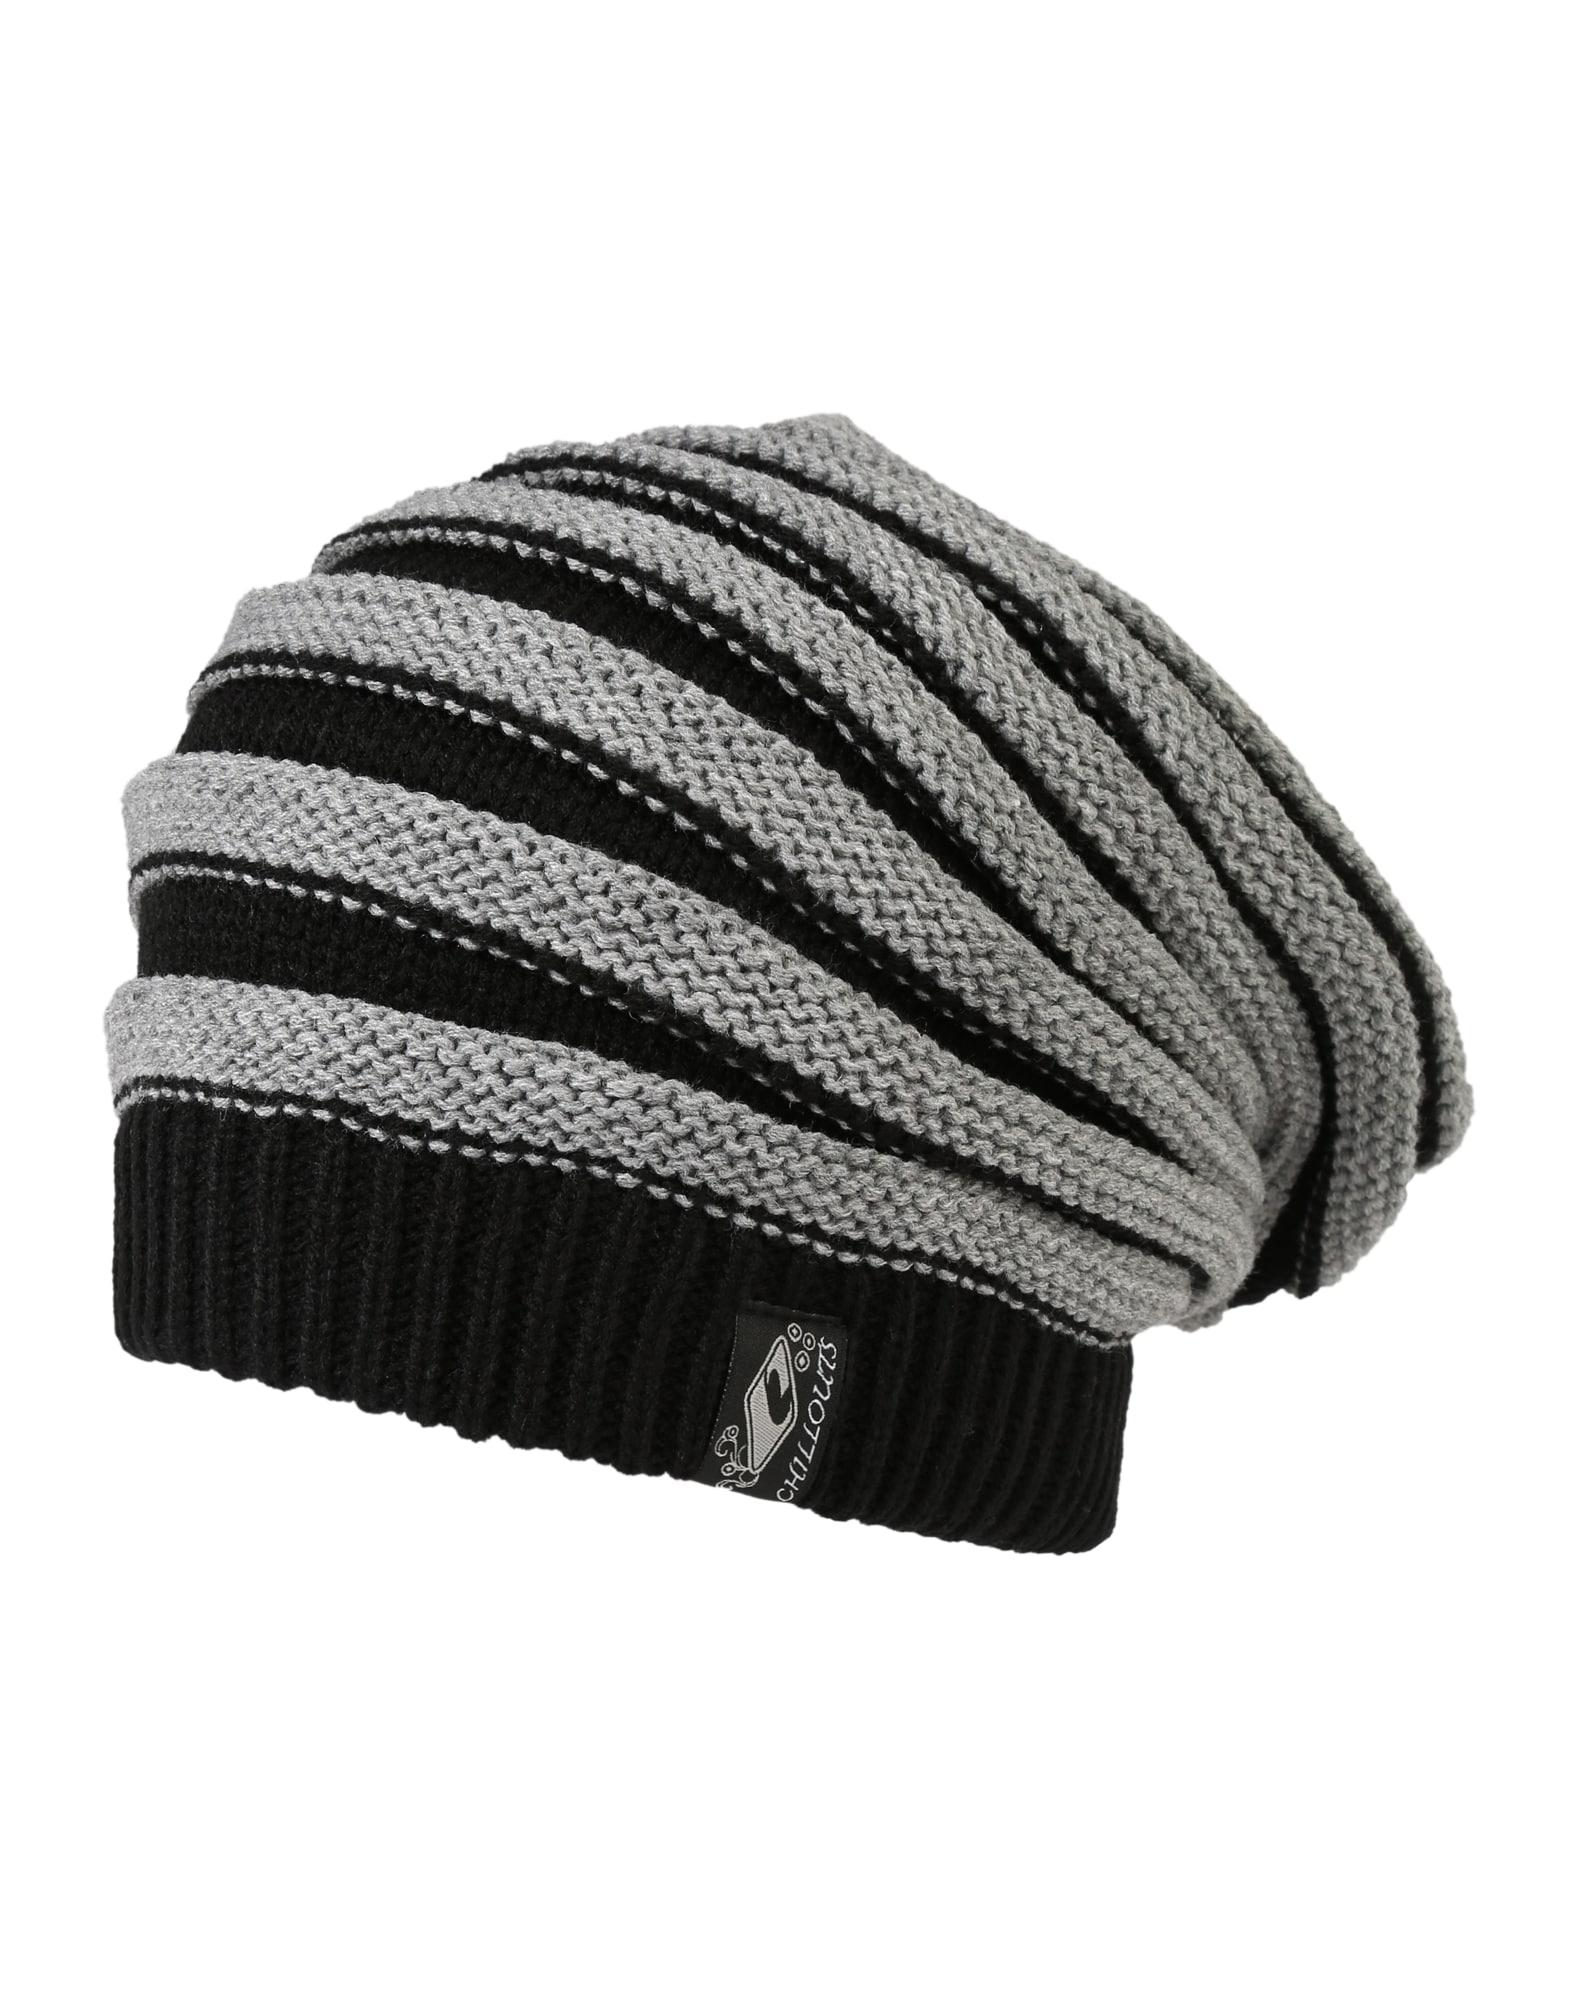 chillouts Megzta kepurė 'Brian' pilka / juoda